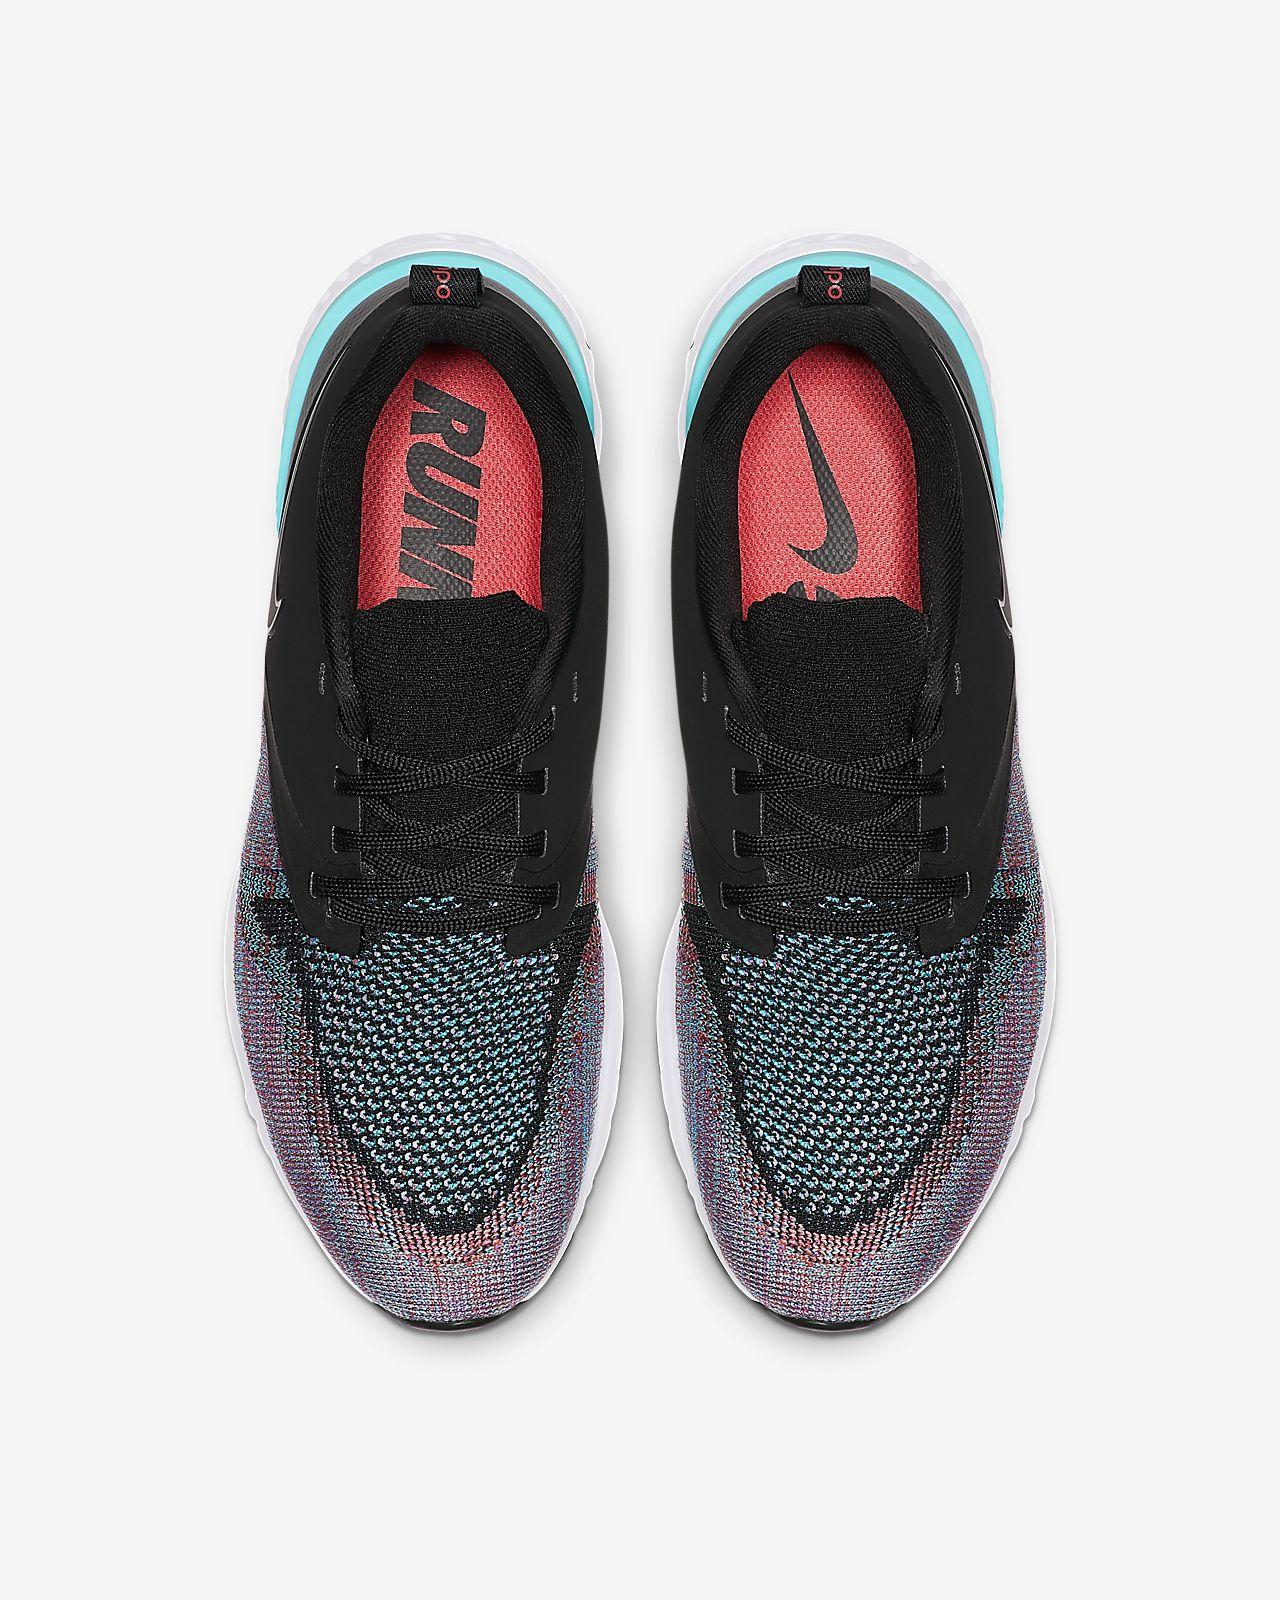 1034279b1dd1d Nike Odyssey React Flyknit 2 Women s Running Shoe. Nike.com